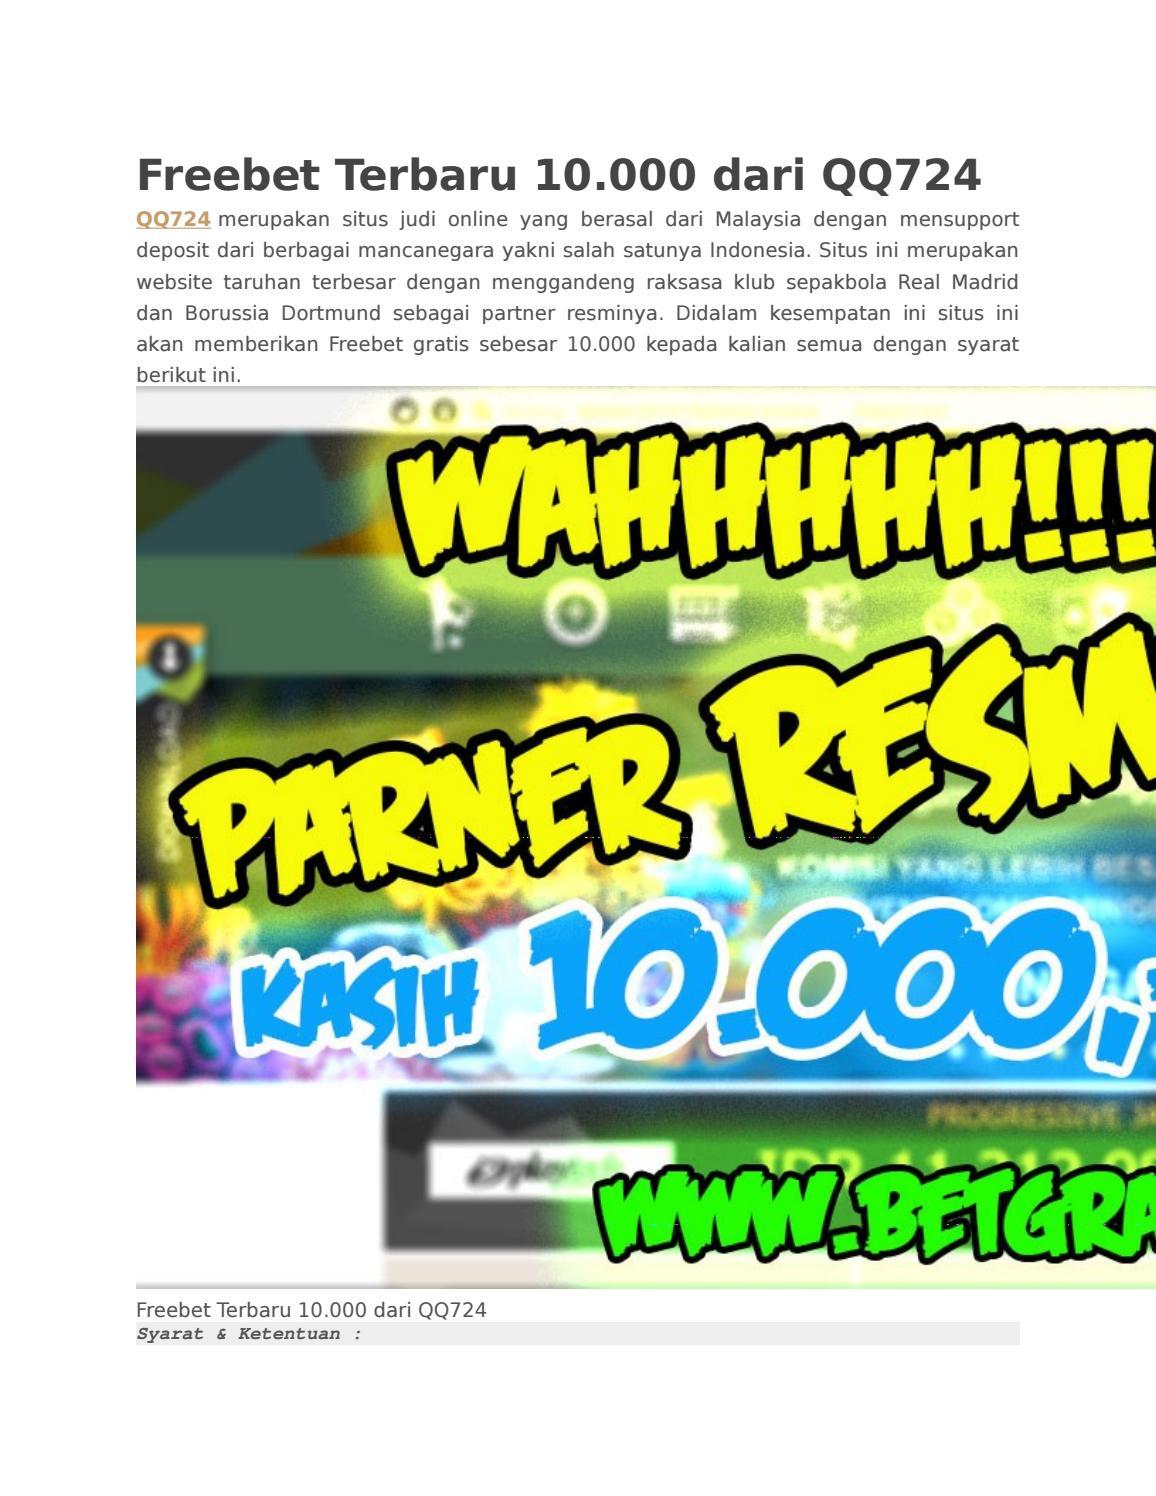 Freebet Terbaru 10 000 Dari Qq724 By Freebet Terbaru Issuu